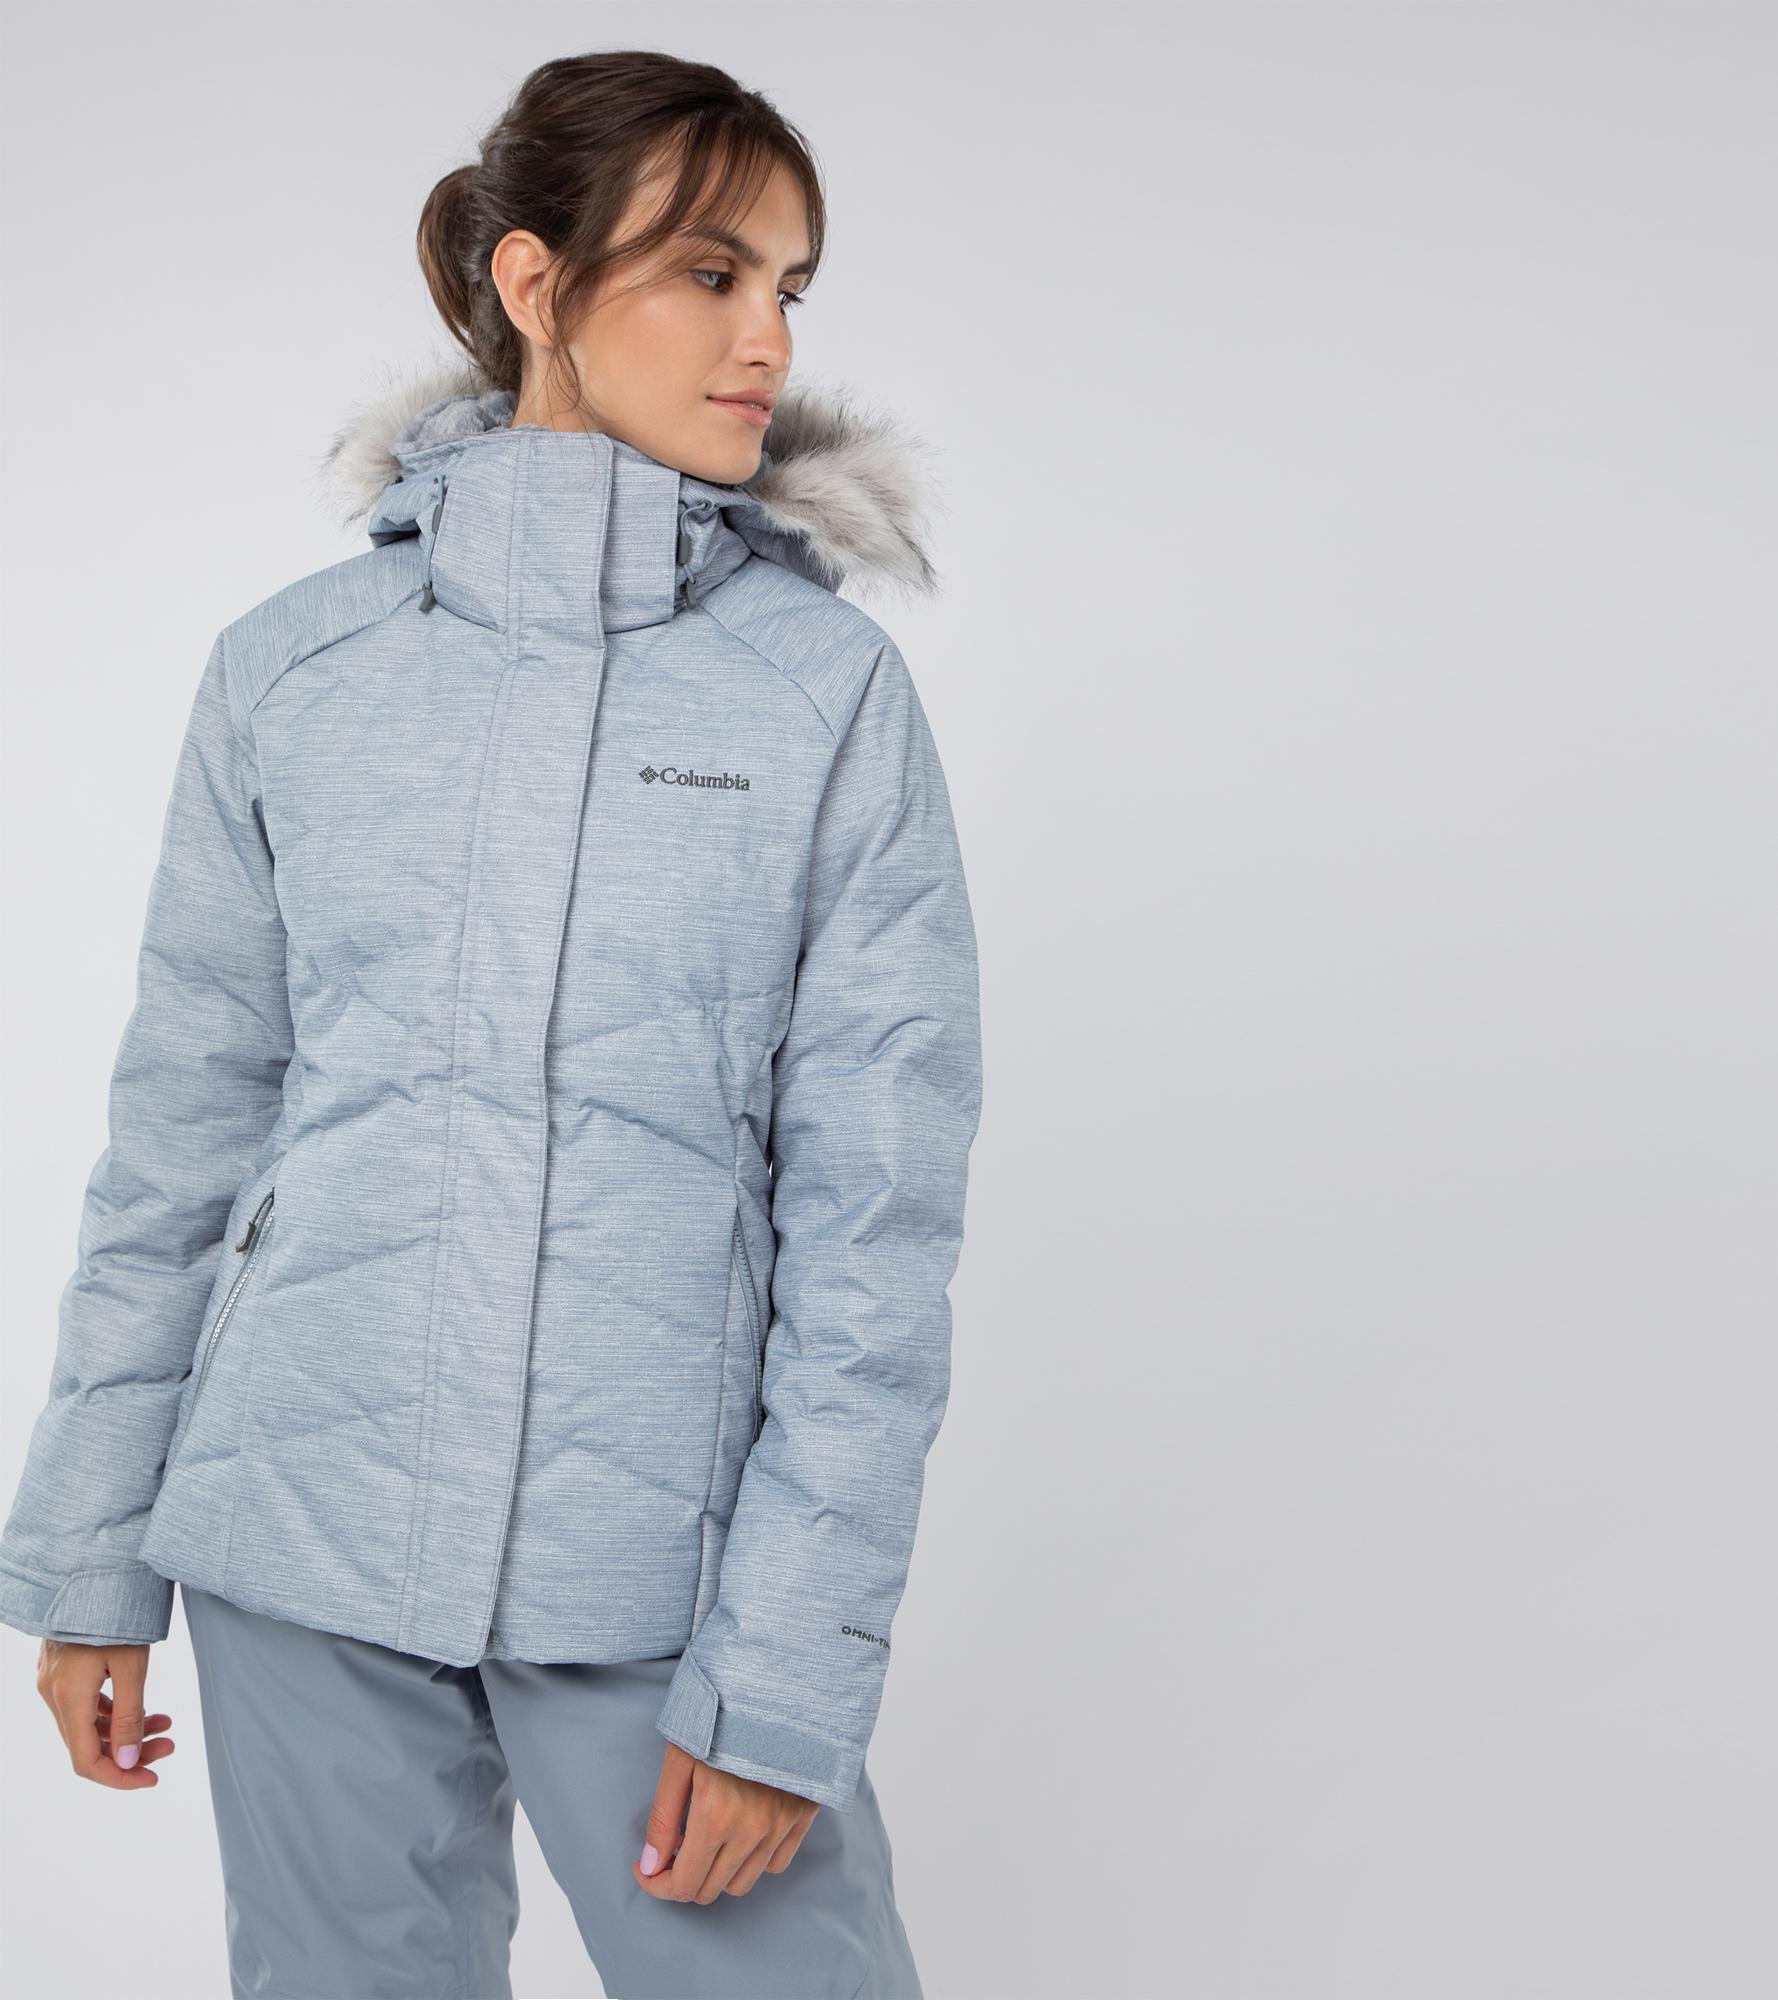 цена на Columbia Куртка пуховая женская Columbia Lay D Down II, размер 50